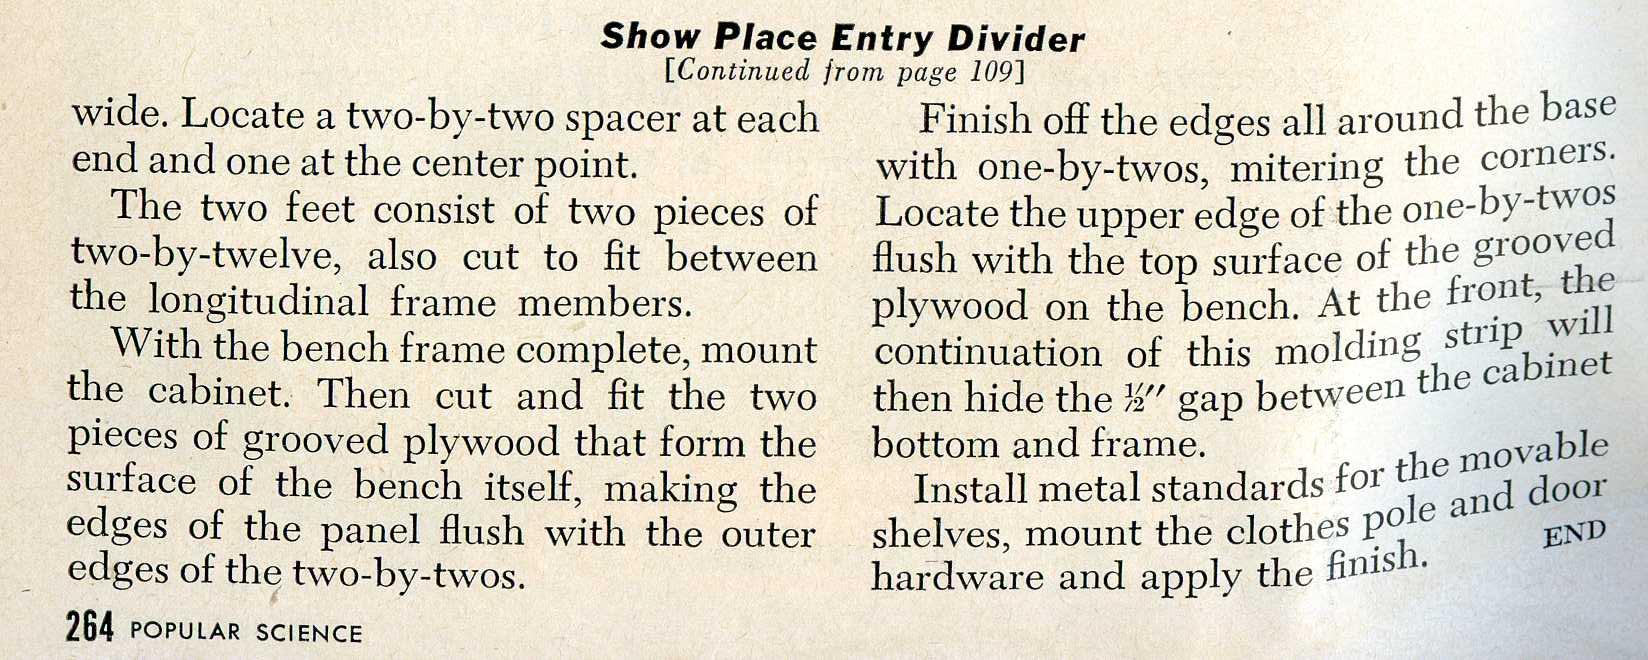 Entry Divider III